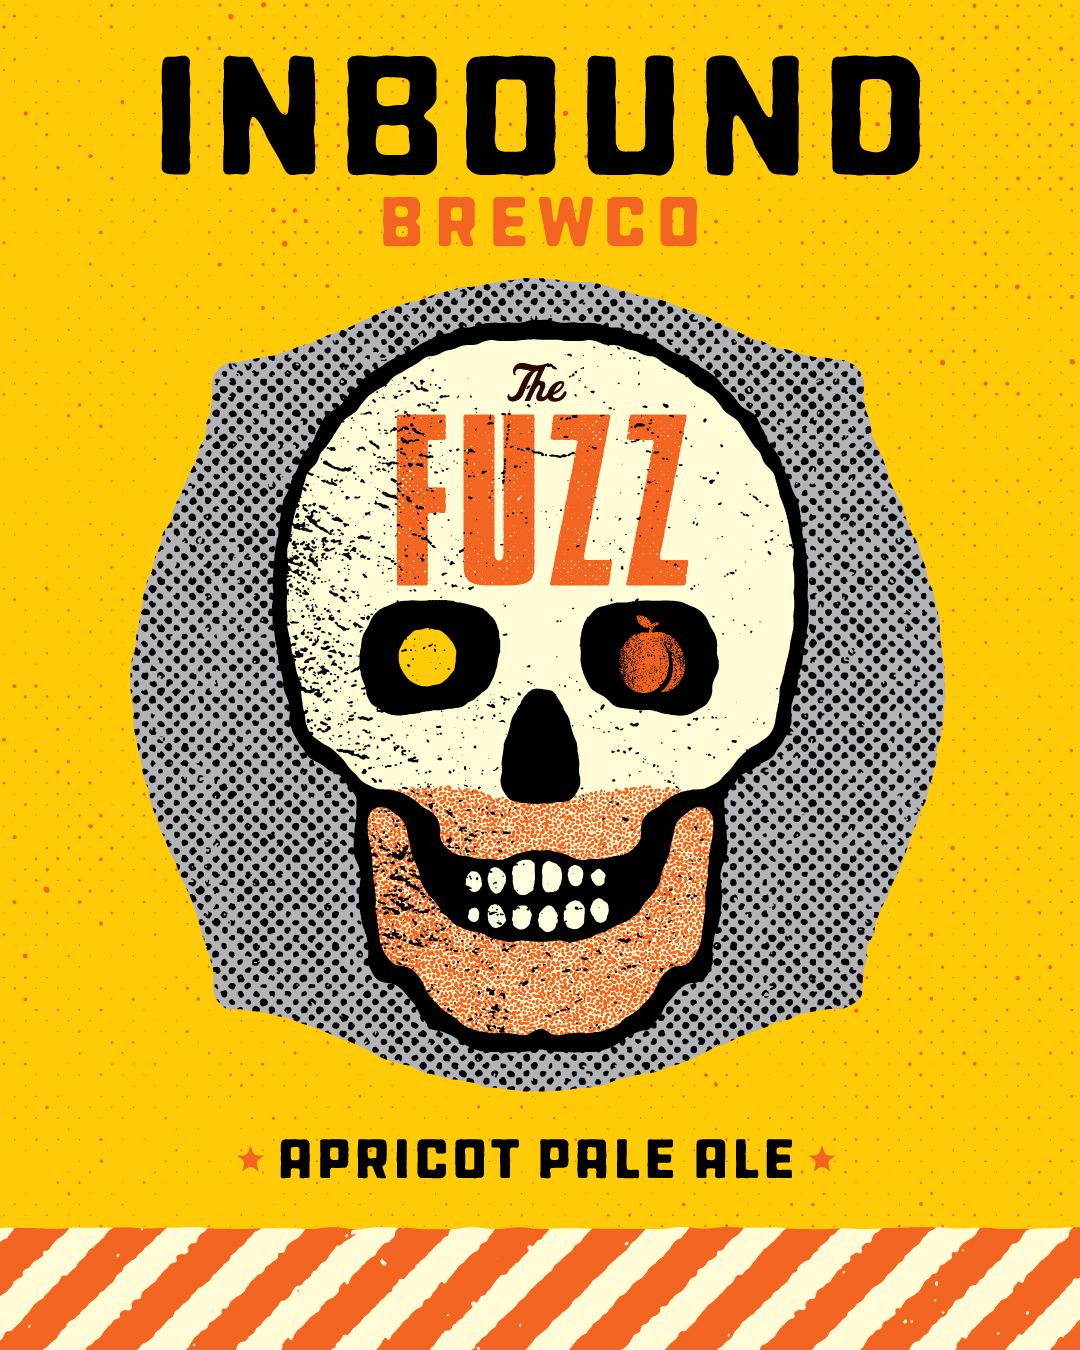 Inbound BrewCo The Fuzz Apricot Pale Ale